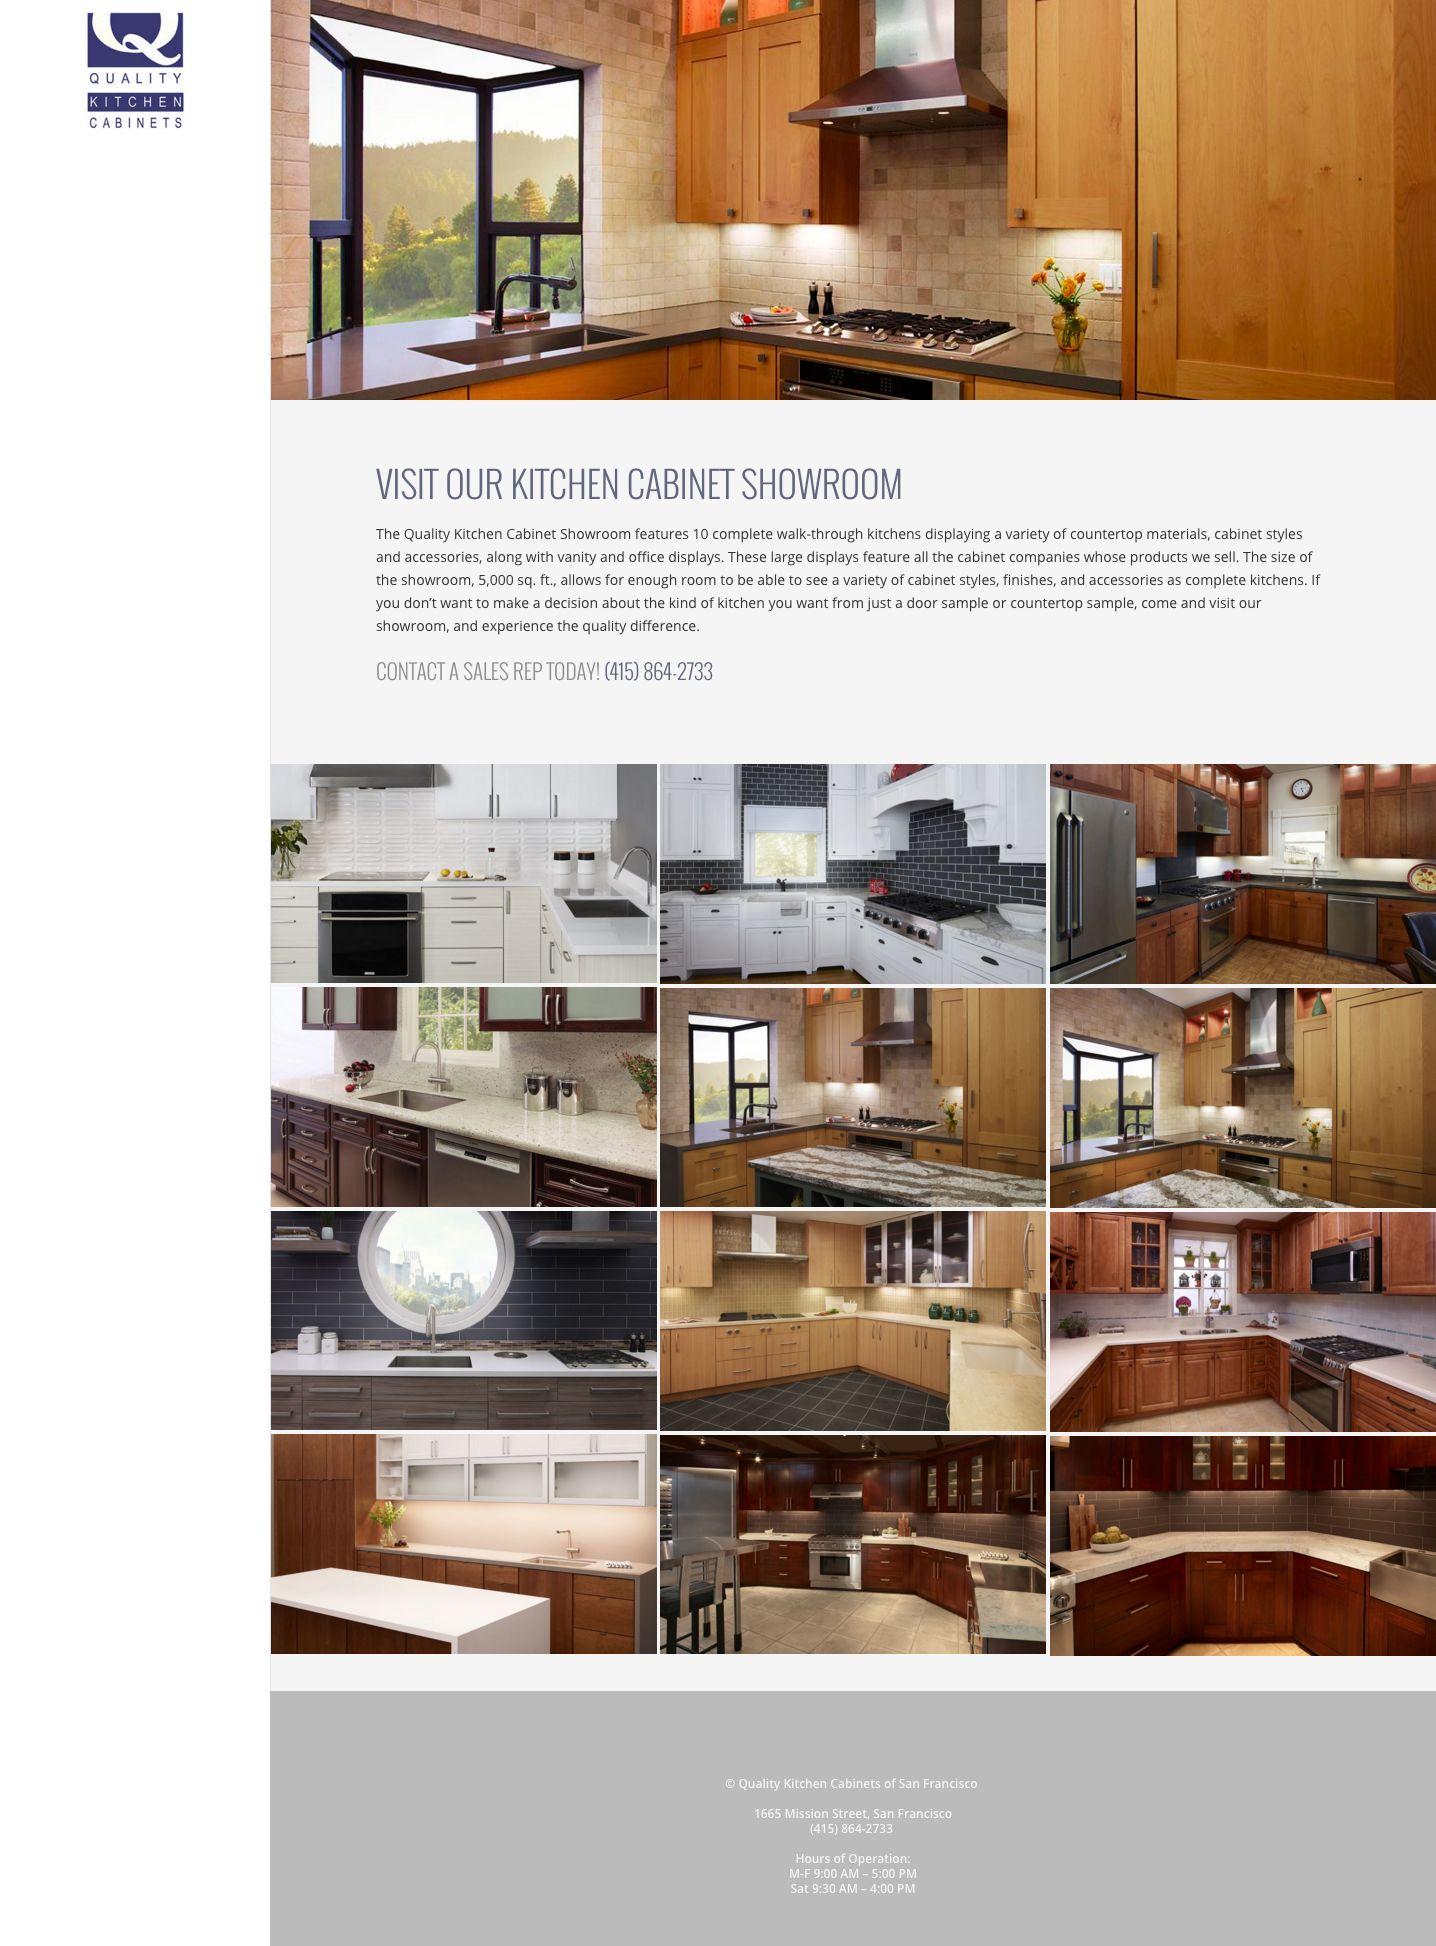 Website design and search engine optimization san for Kitchen cabinets zen